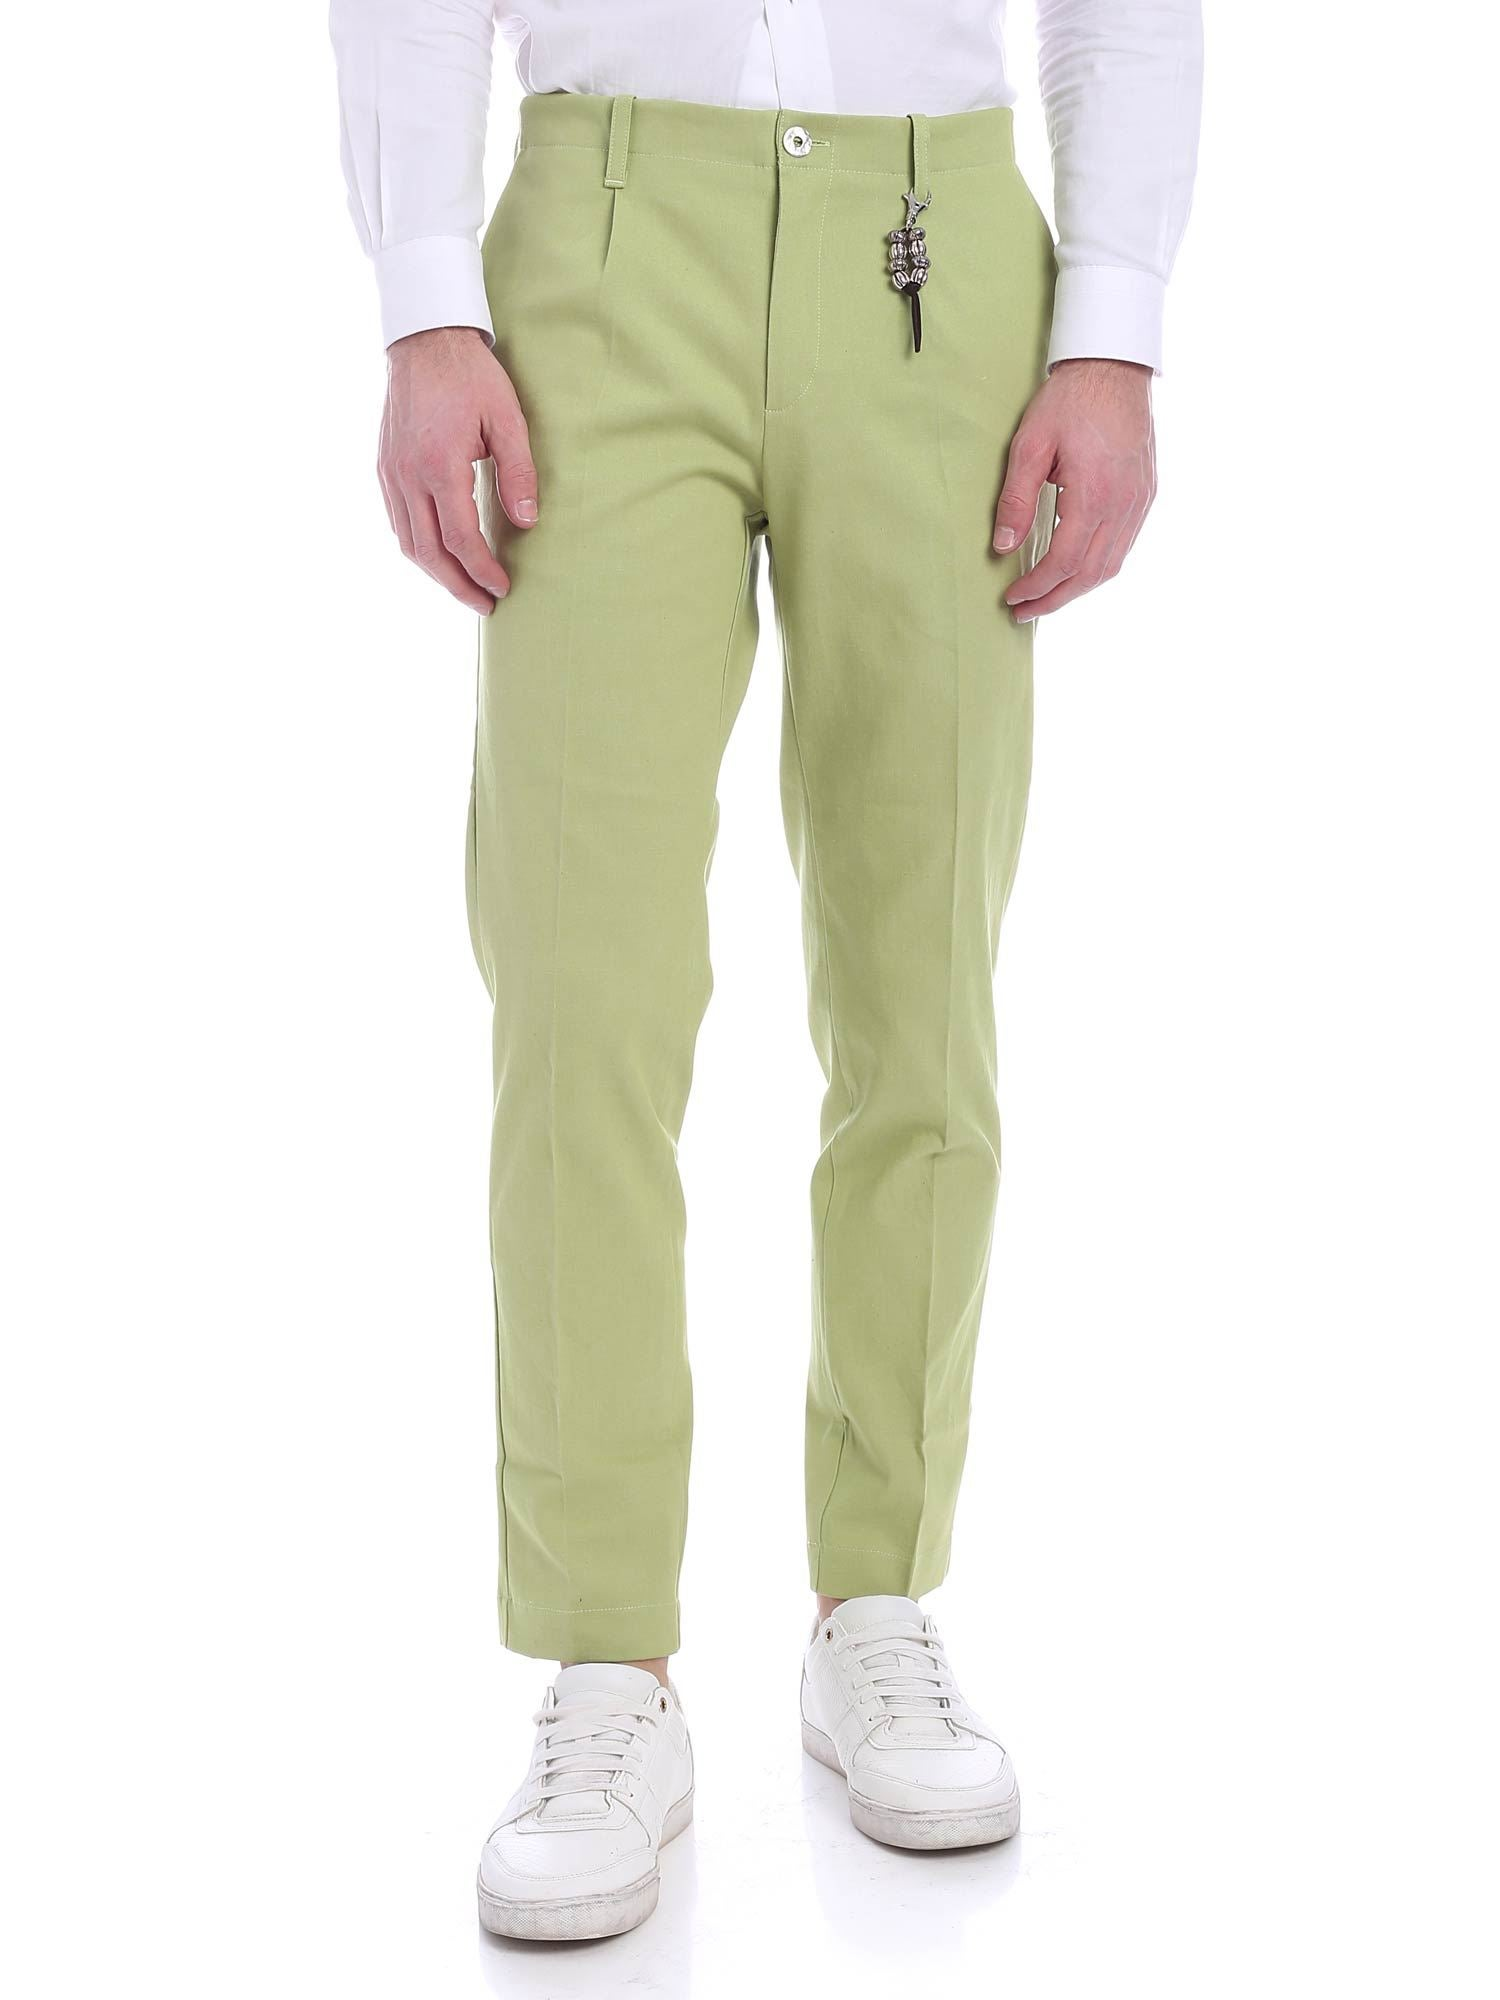 Image of Pantalone una pence verde lime R92 D-LI